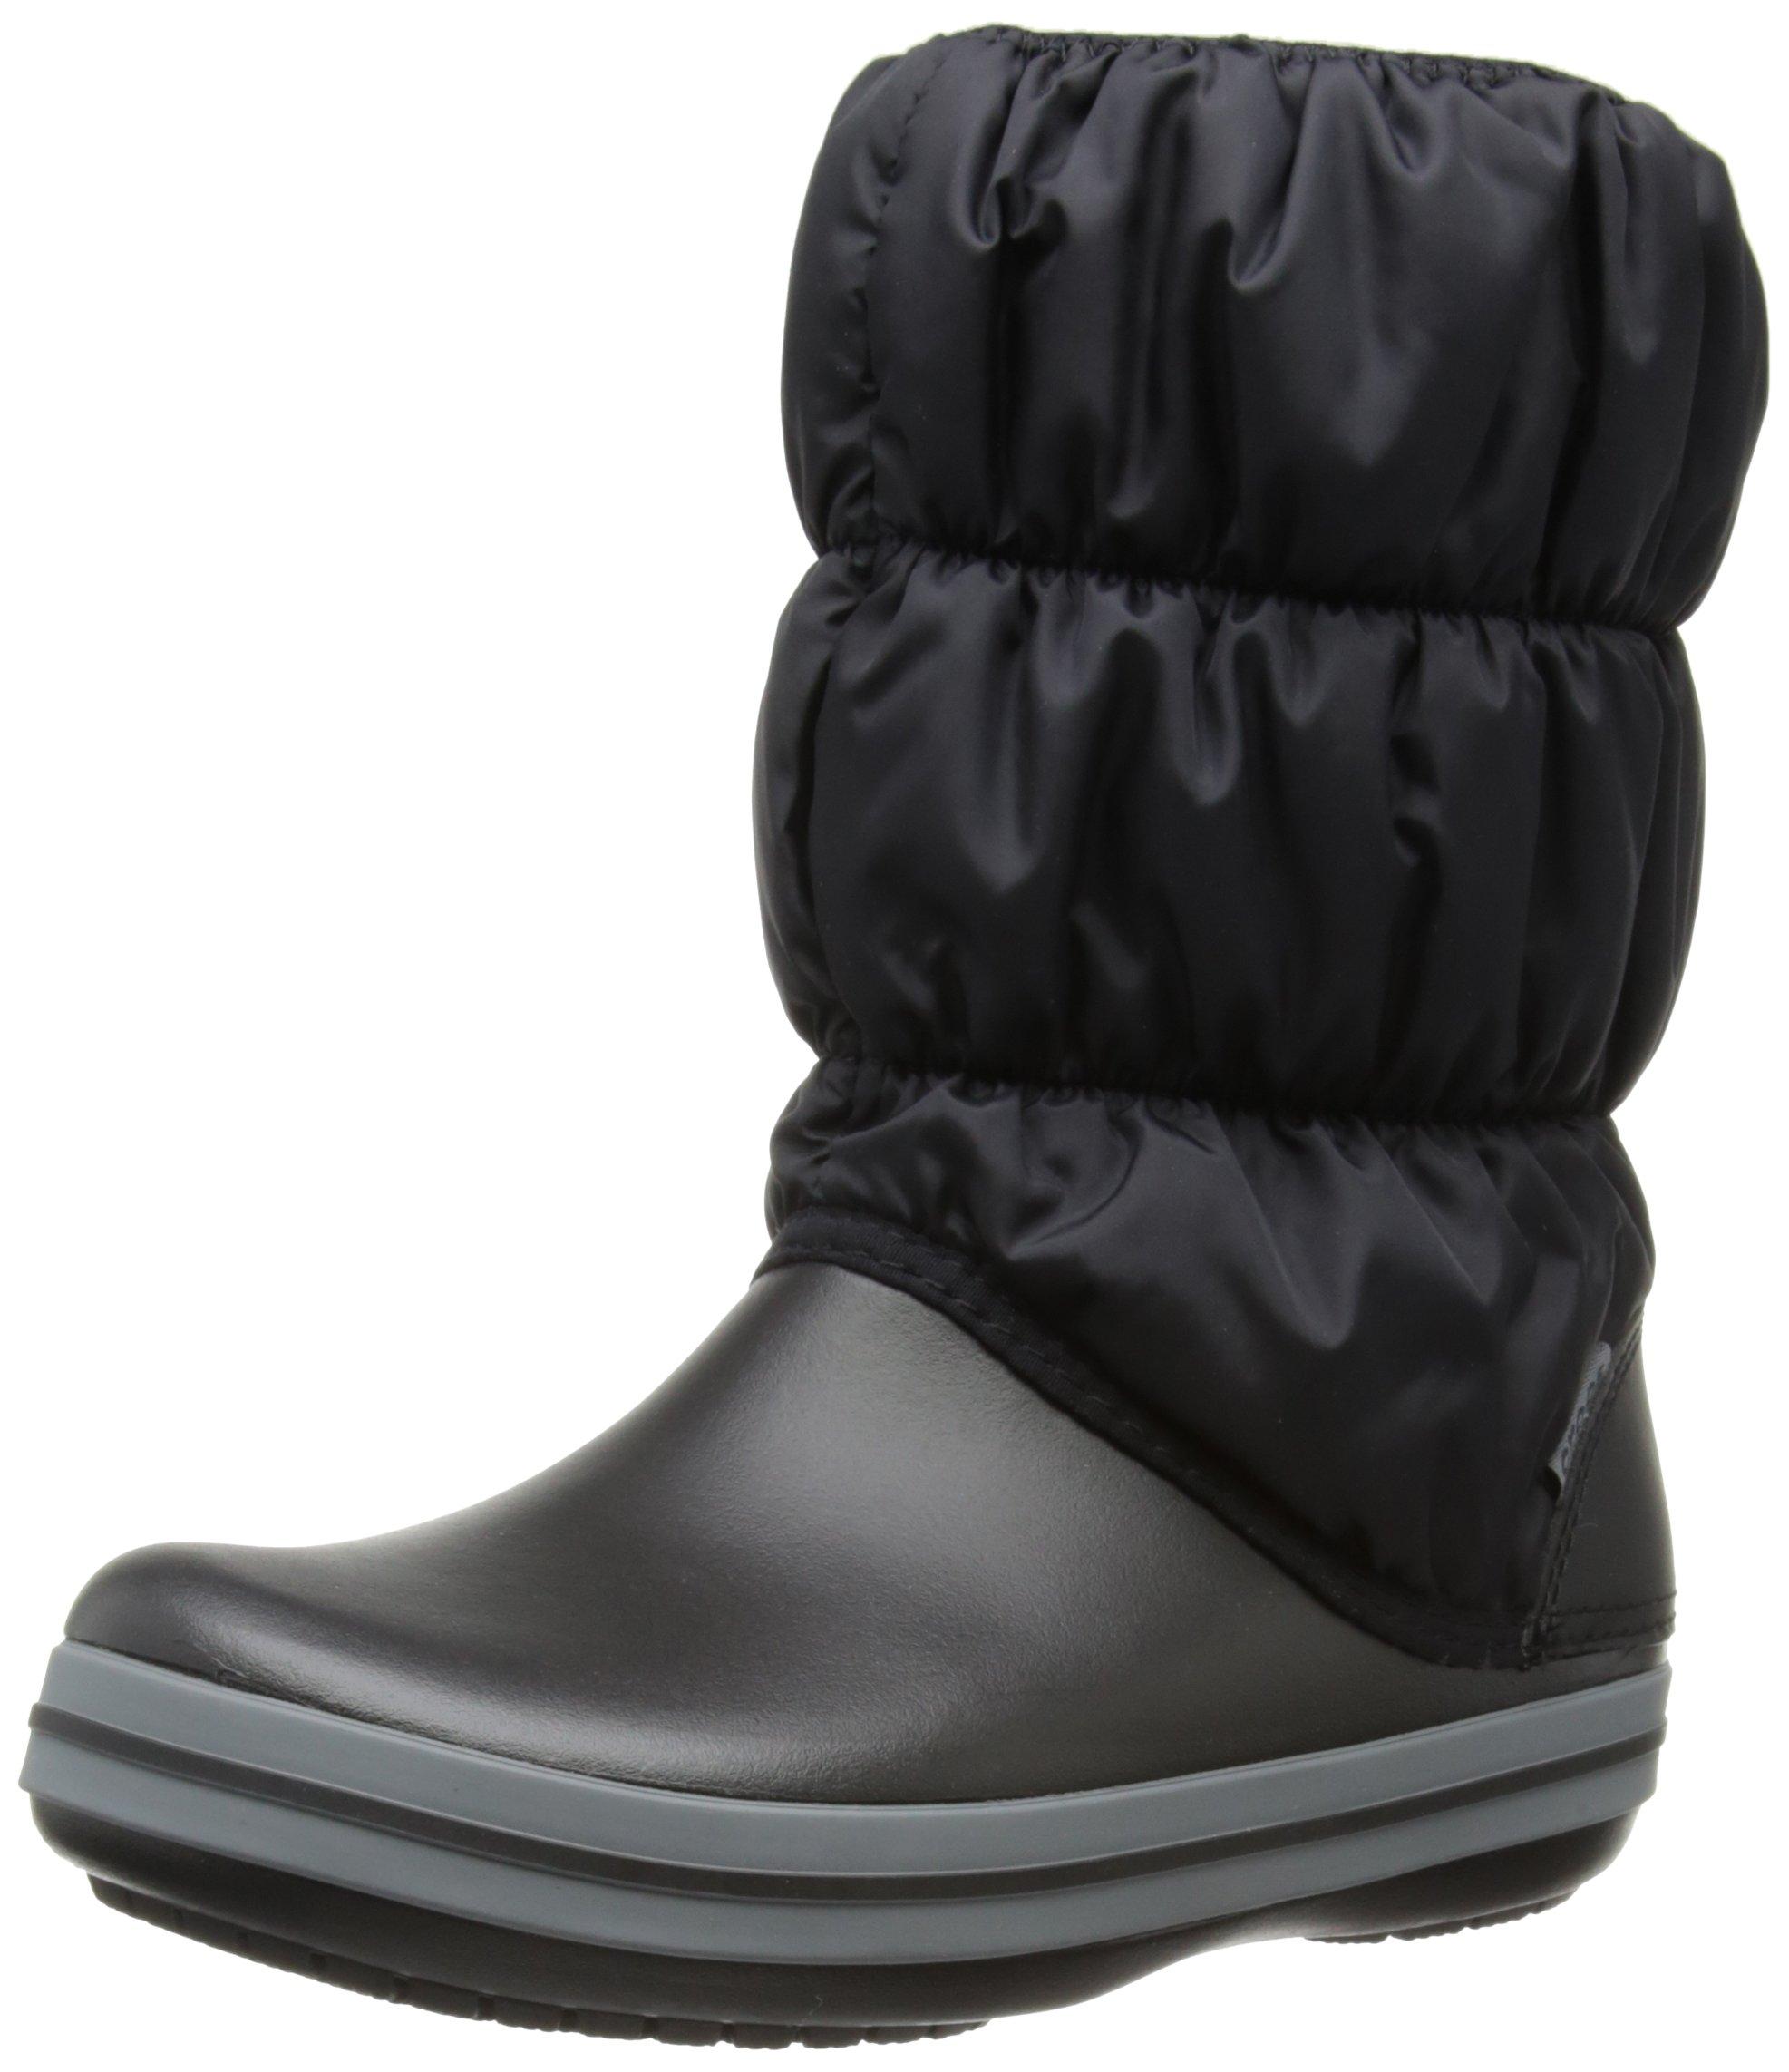 FemmeNoirblack De WomenBottes Crocs Eu Winter Boot 42 charcoal41 Neige Puff CxWerdBo